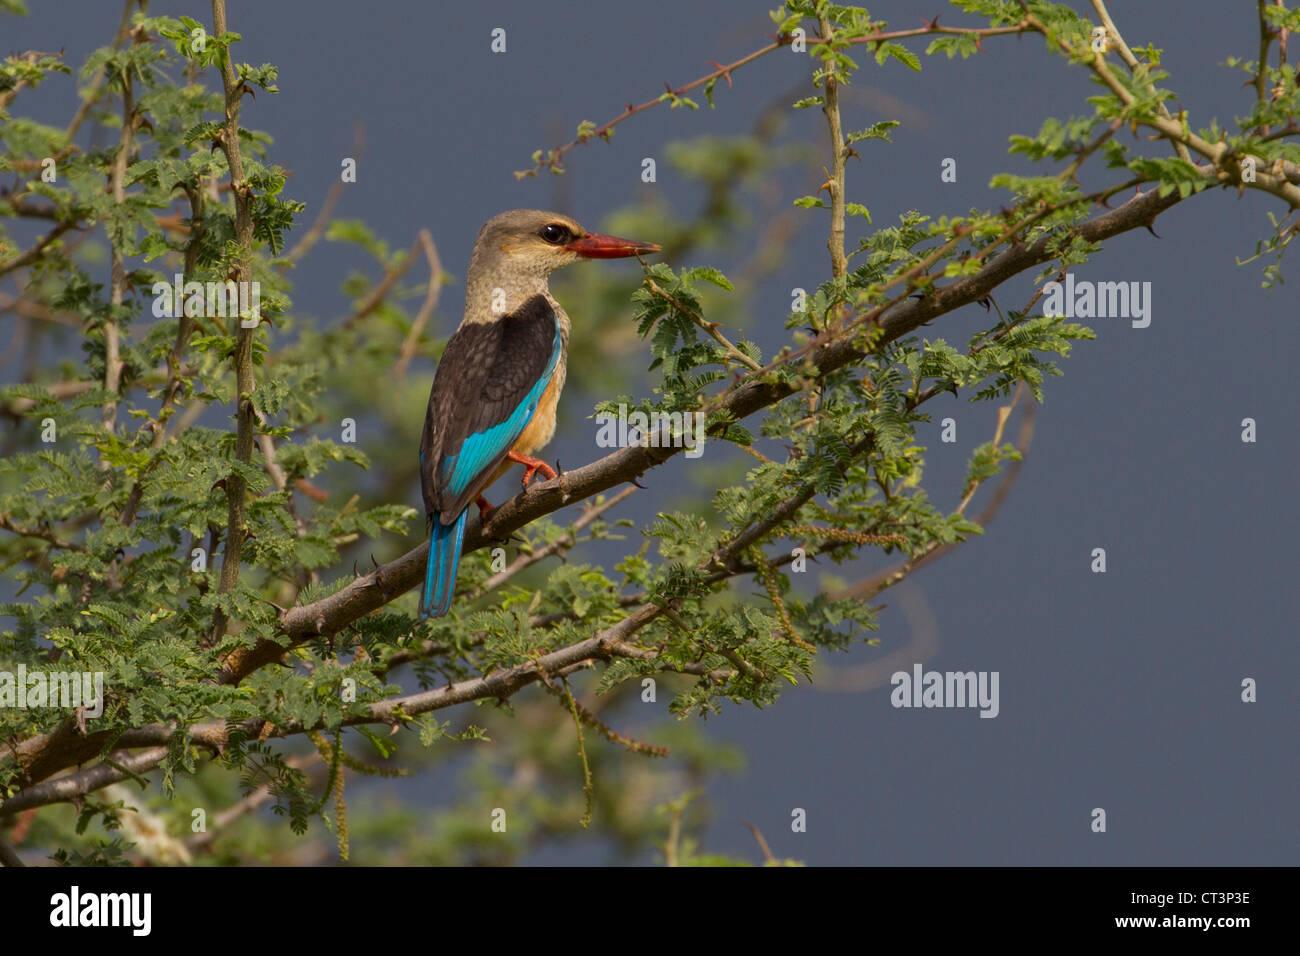 Grey-Headed Kingfisher (Halcyon leucocephala), Murchison Falls National Park, Uganda - Stock Image